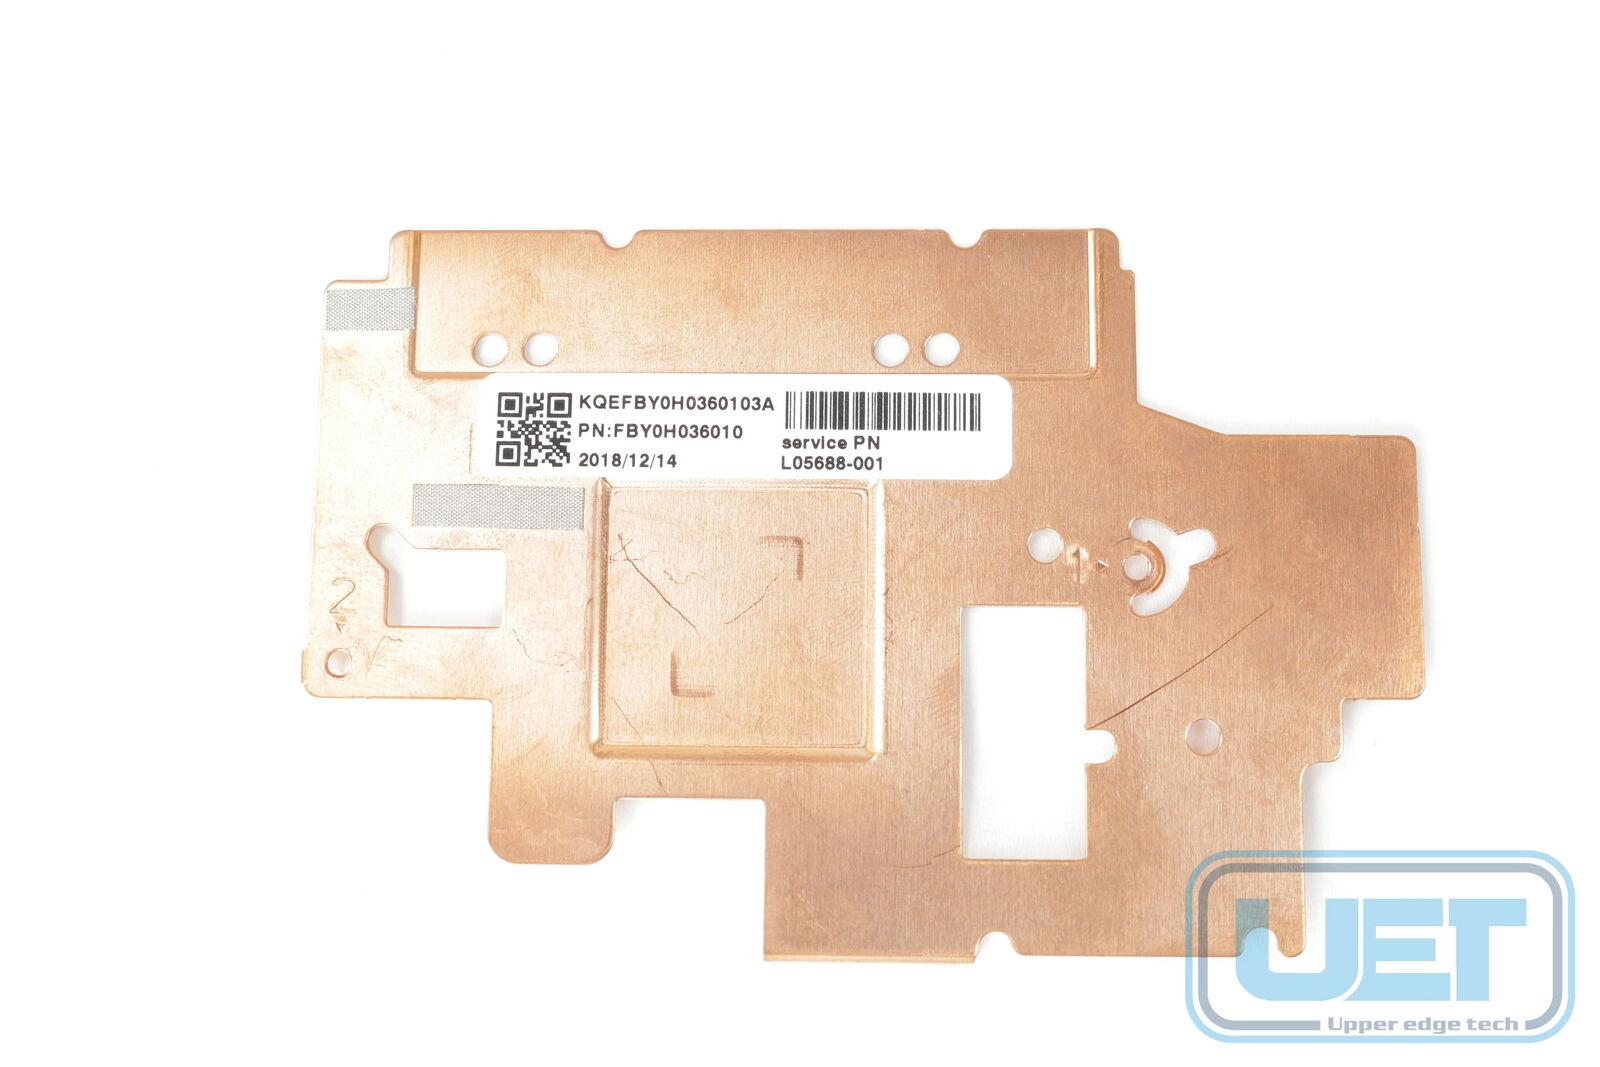 HP Chromebook 11 G4 EE CPU Only Heatsink L05688-001 Tested Warranty